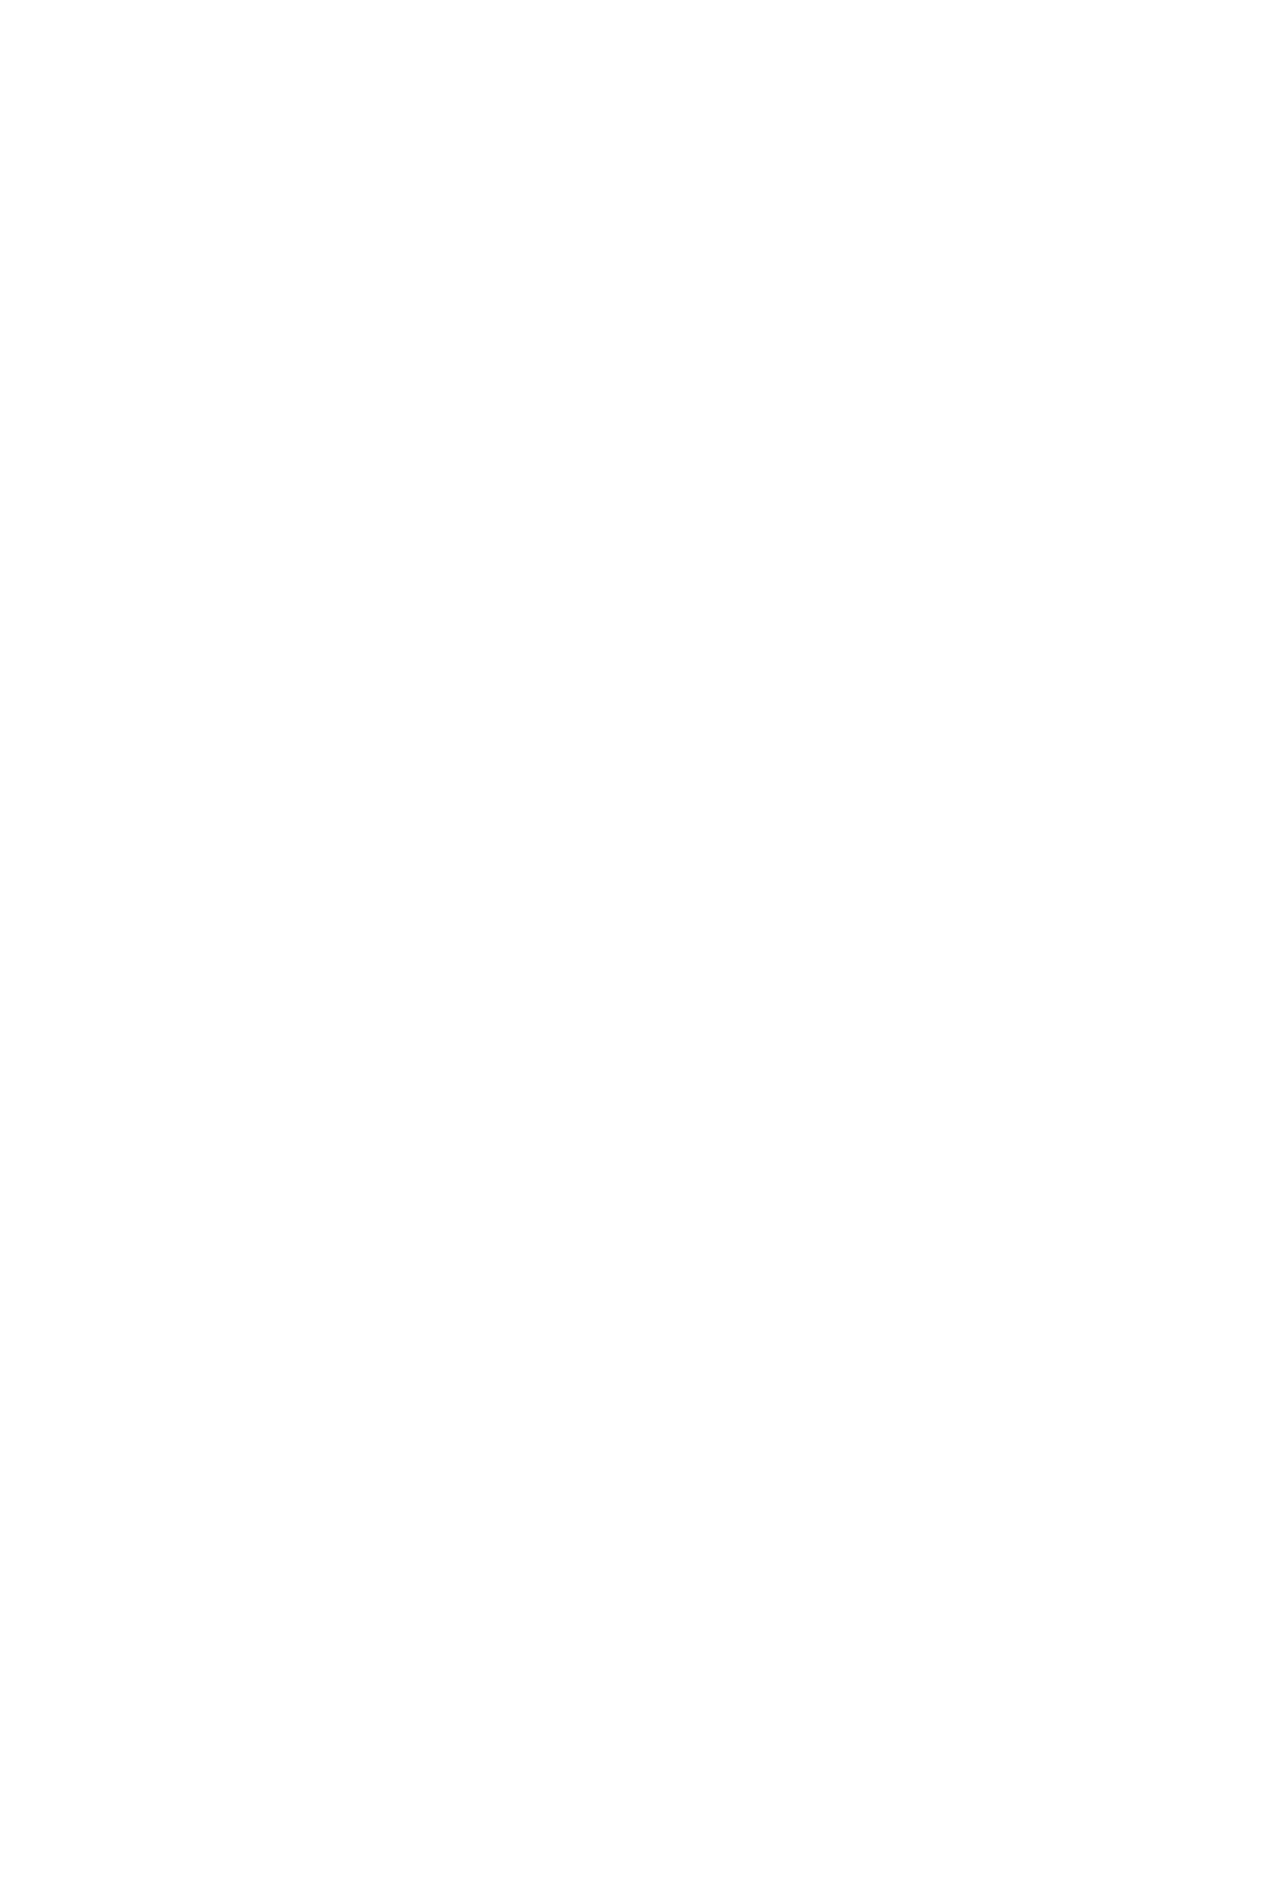 [Eromazun (Ma-Kurou)] Saint Helena Gakuen 2 ~ Terrorist ni Senkyosareta Jogakuen de Rape Matsuri!~   Saint Helena Academy 2 ~A School Occupied by Terrorists Becomes a Rape Festival!~ (Various) [English] [B.E.C. Scans] 46